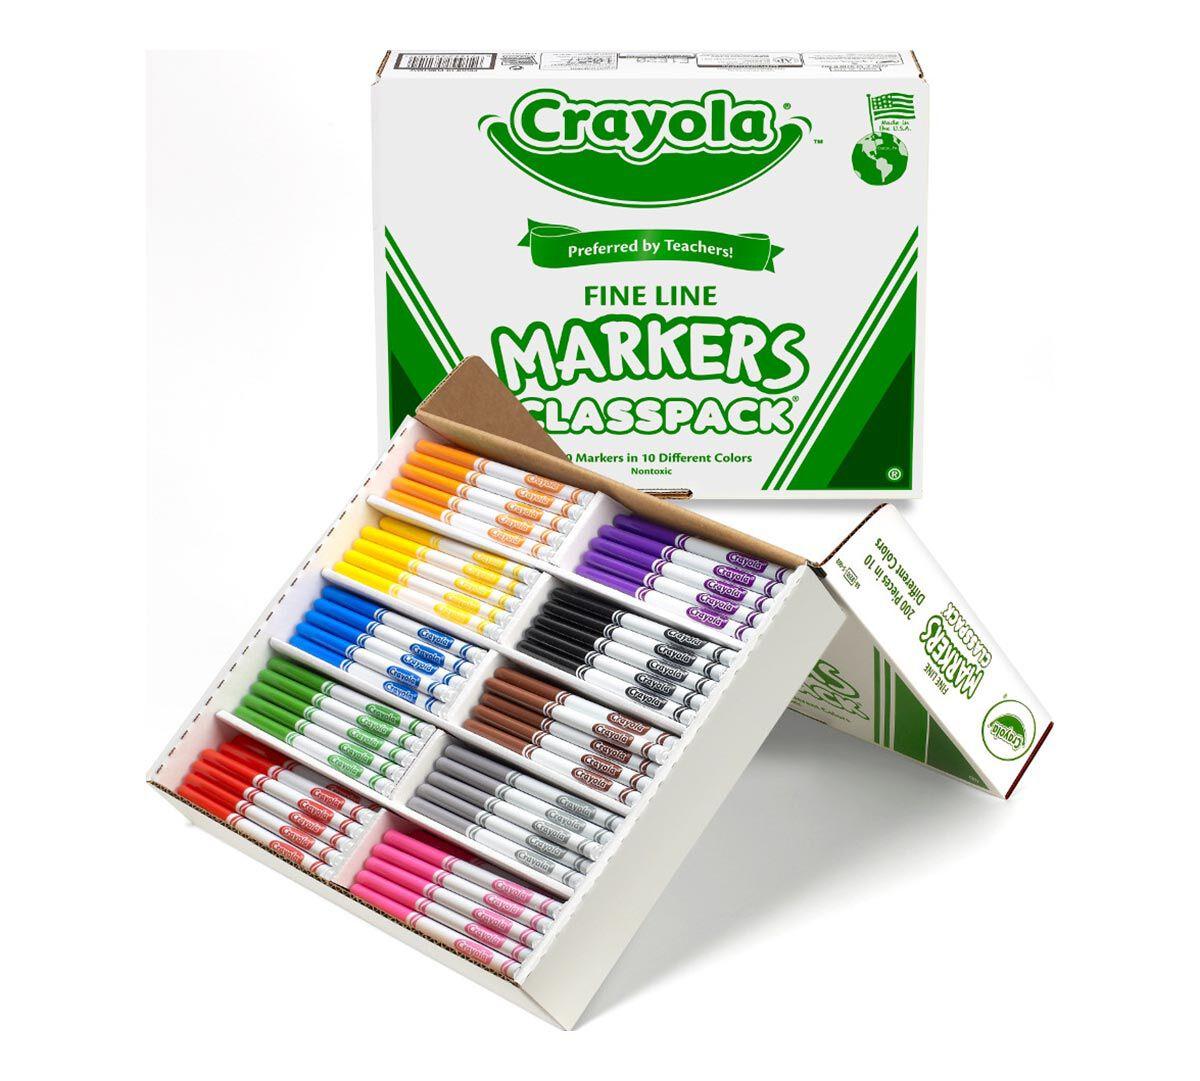 200 Count Crayola Fine Line Markers Classpack, 10 Colors - Crayola